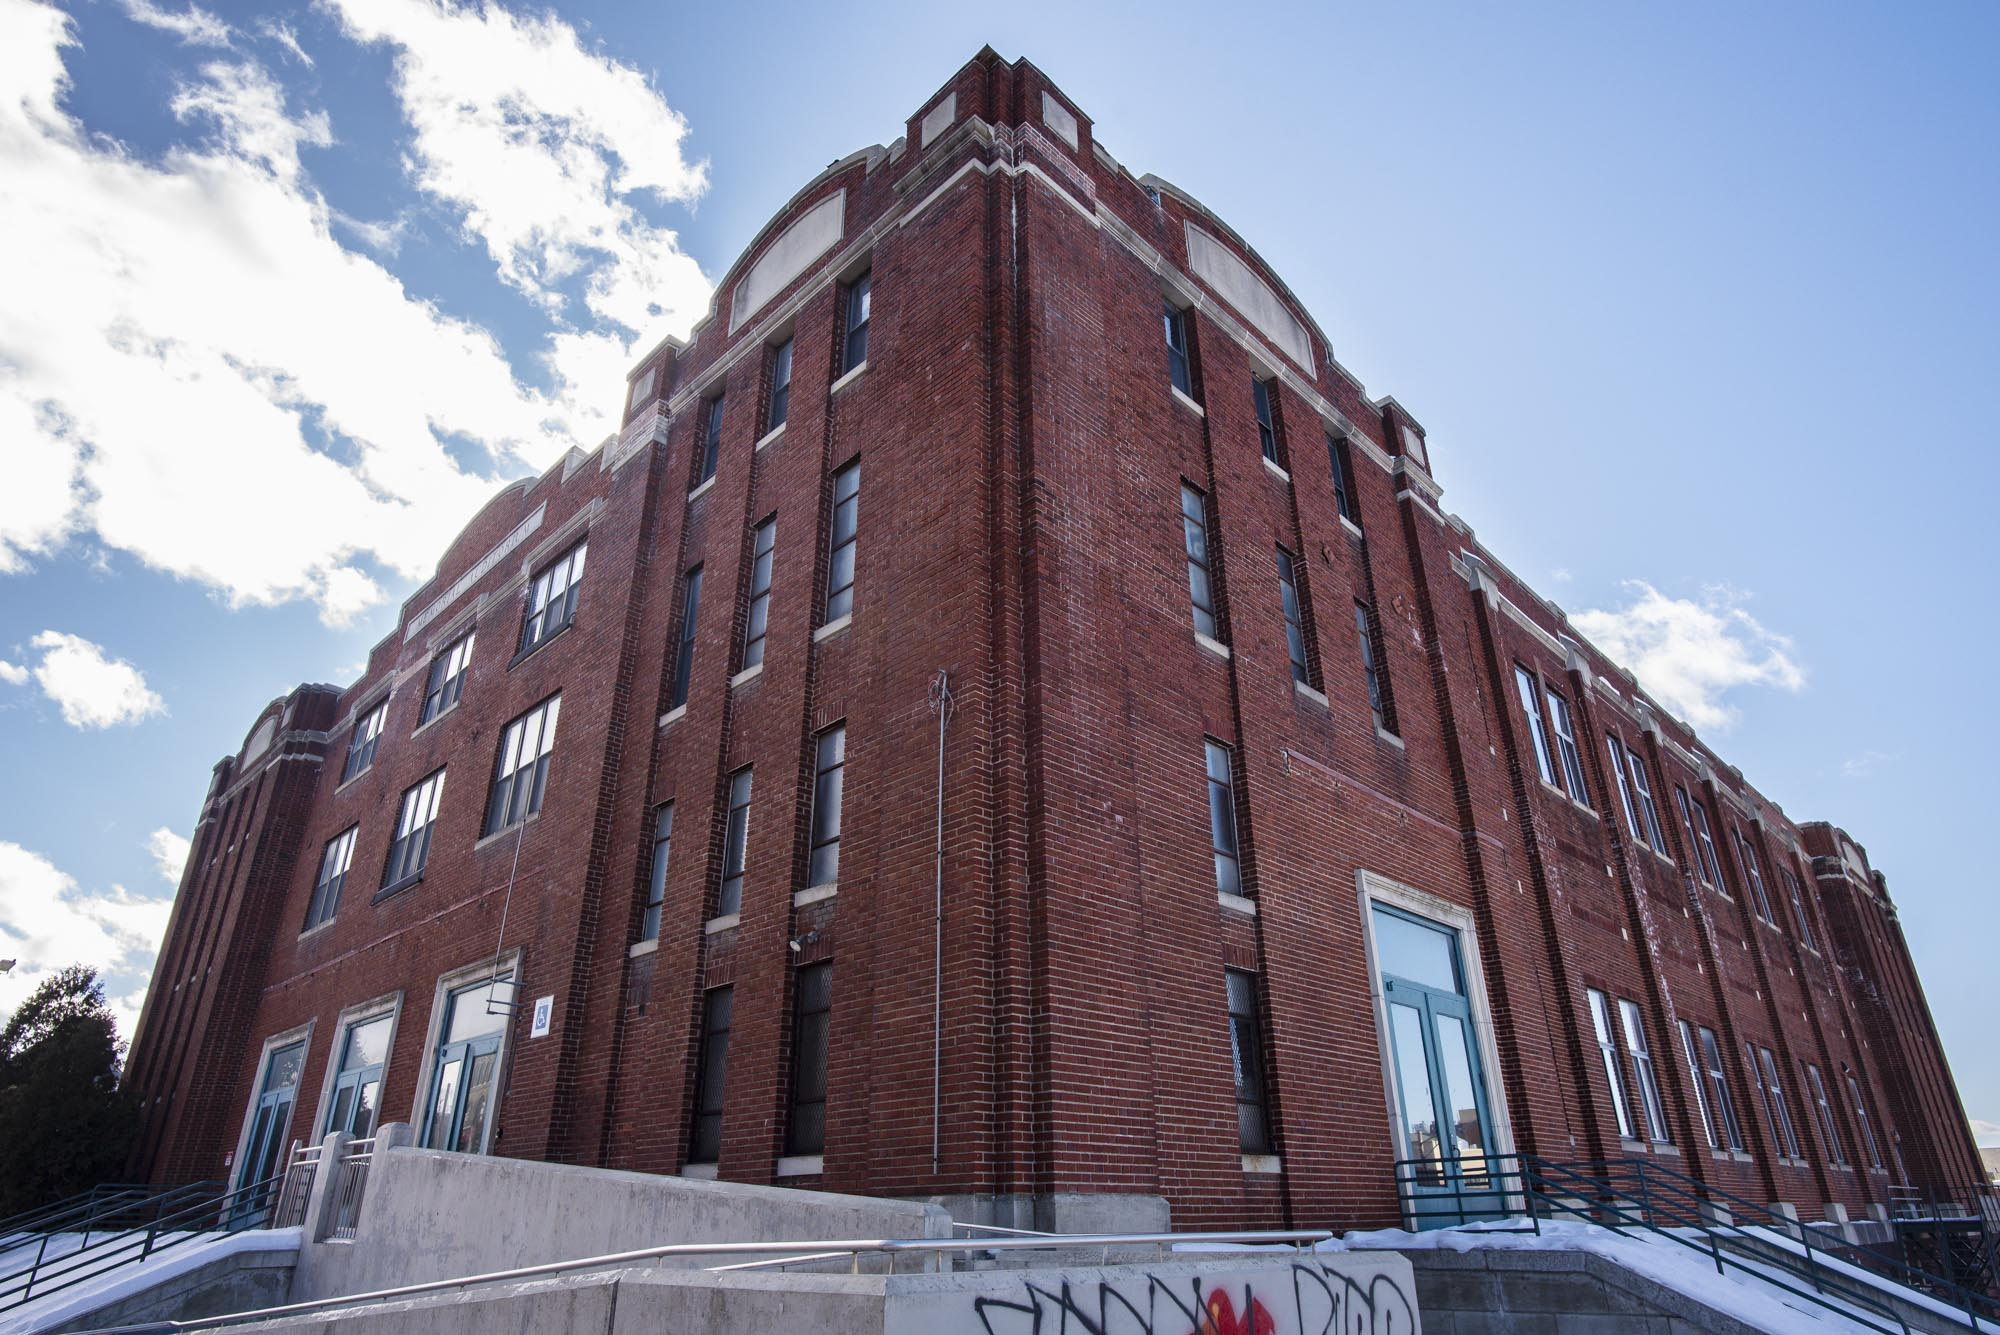 Memorial Auditorium renovation plans on hold until pandemic subsides